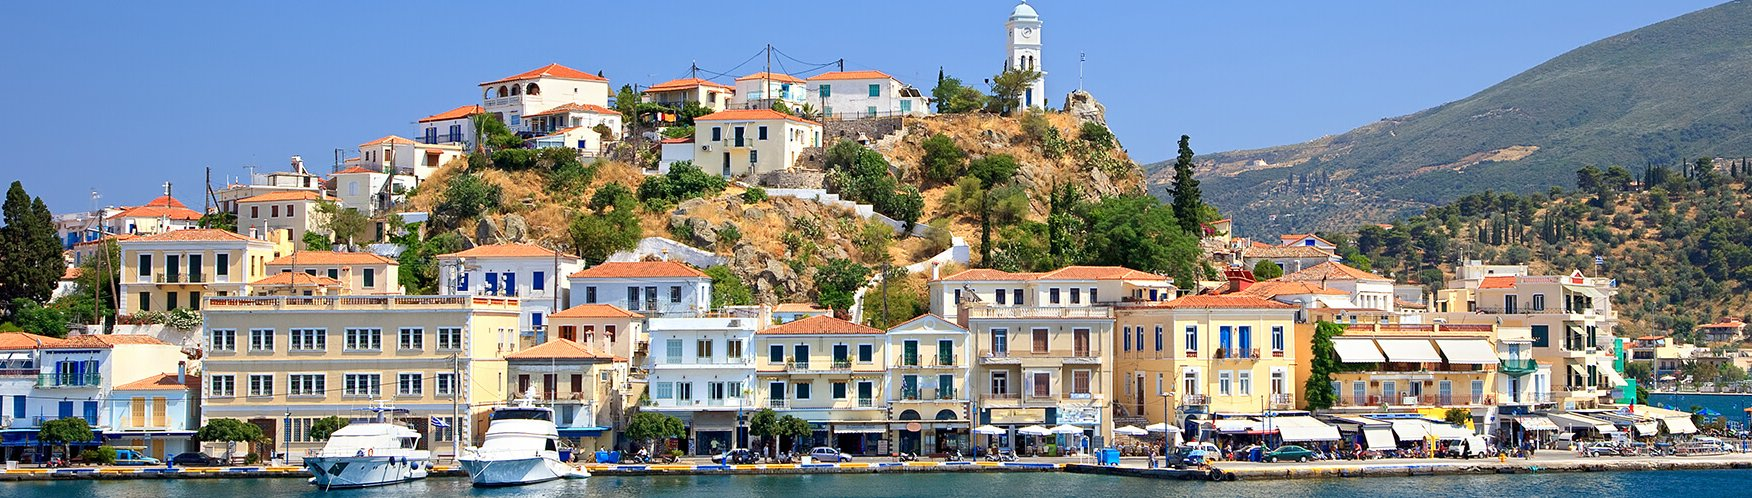 Griekenland-Flottielje-Pors_1900-500